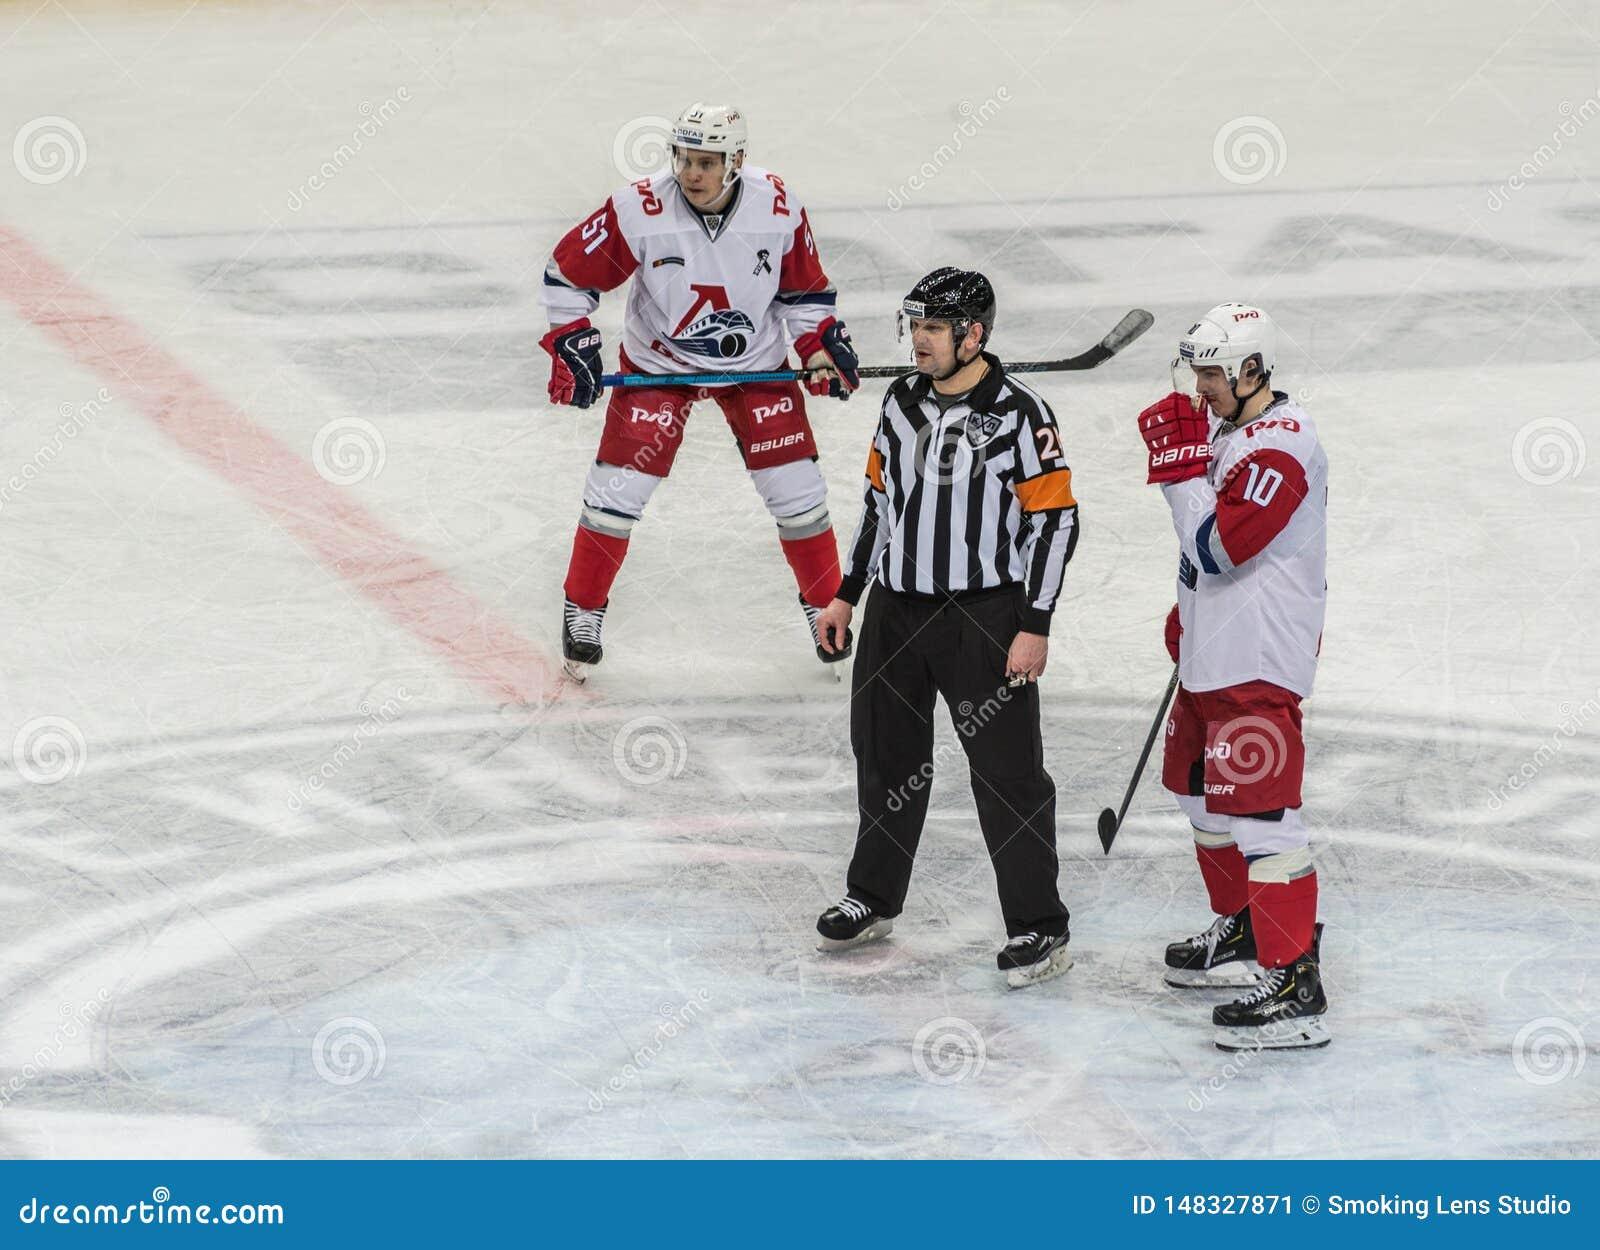 Hokeja na lodzie gra, gracze i arbiter,